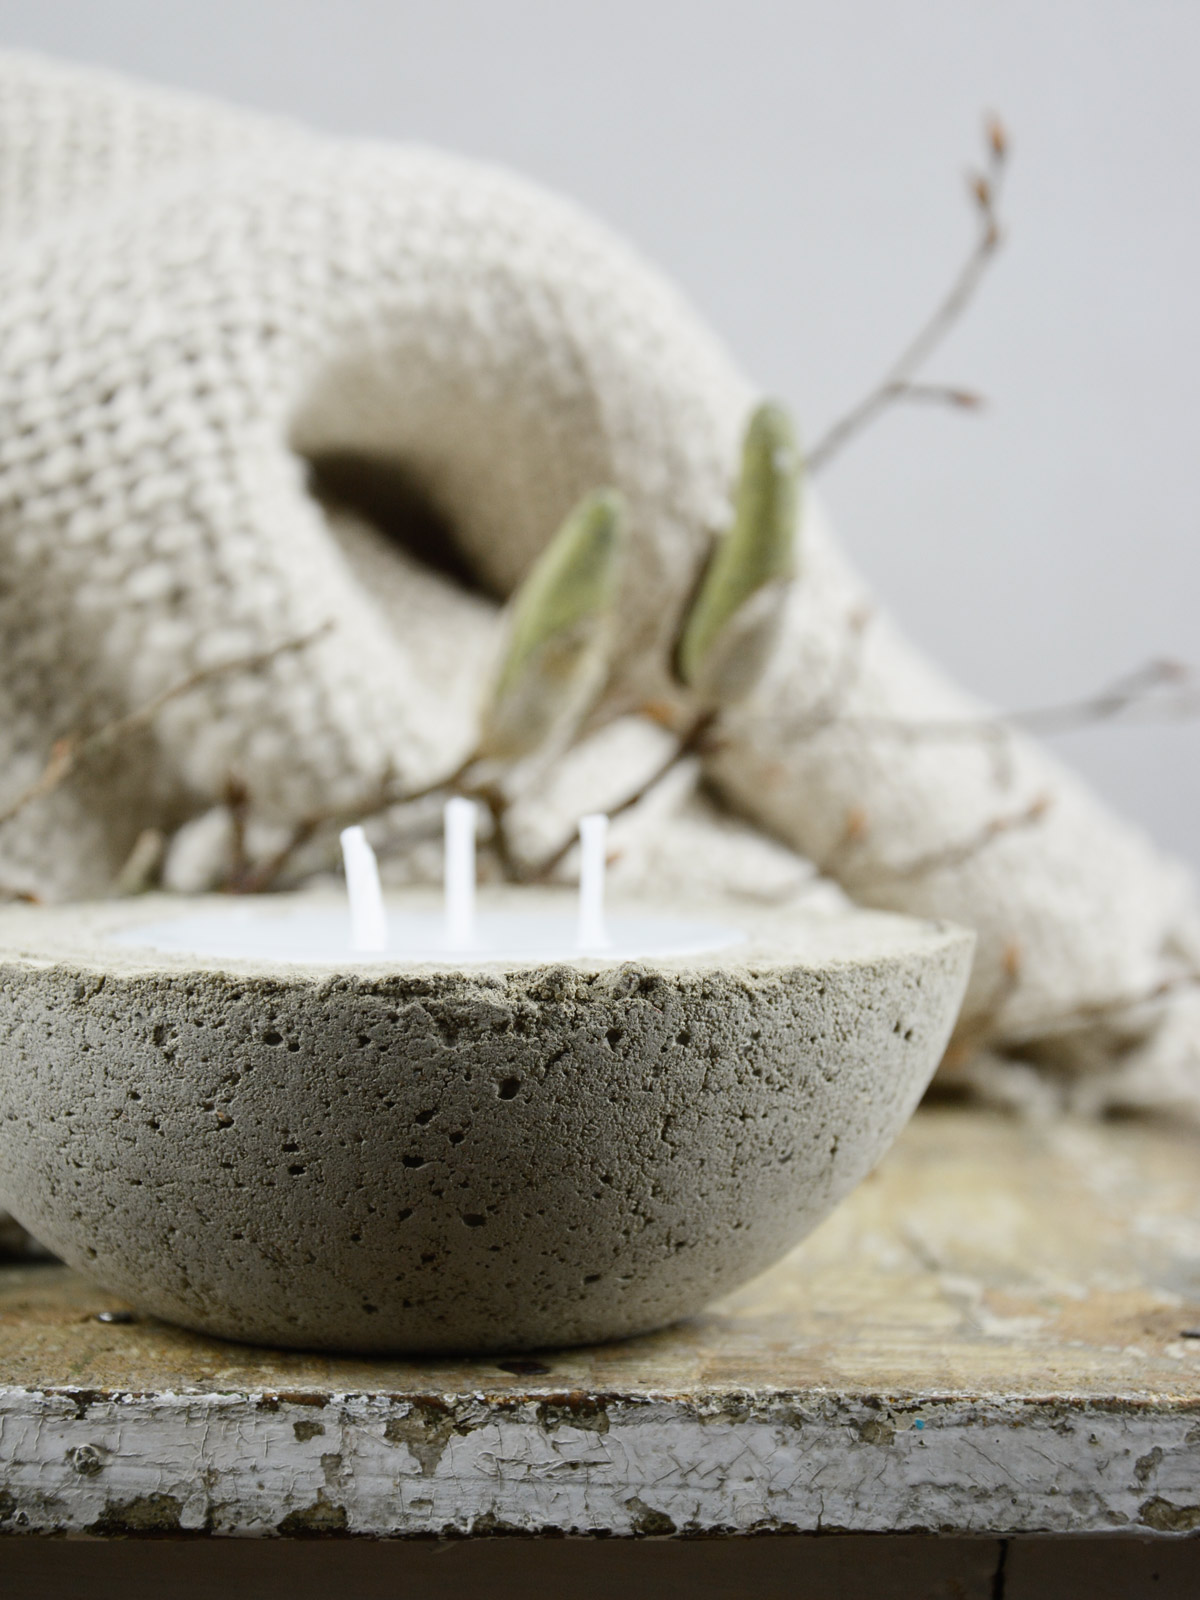 diy | kerzen selber machen mit beton und wachs – mxliving, Garten ideen